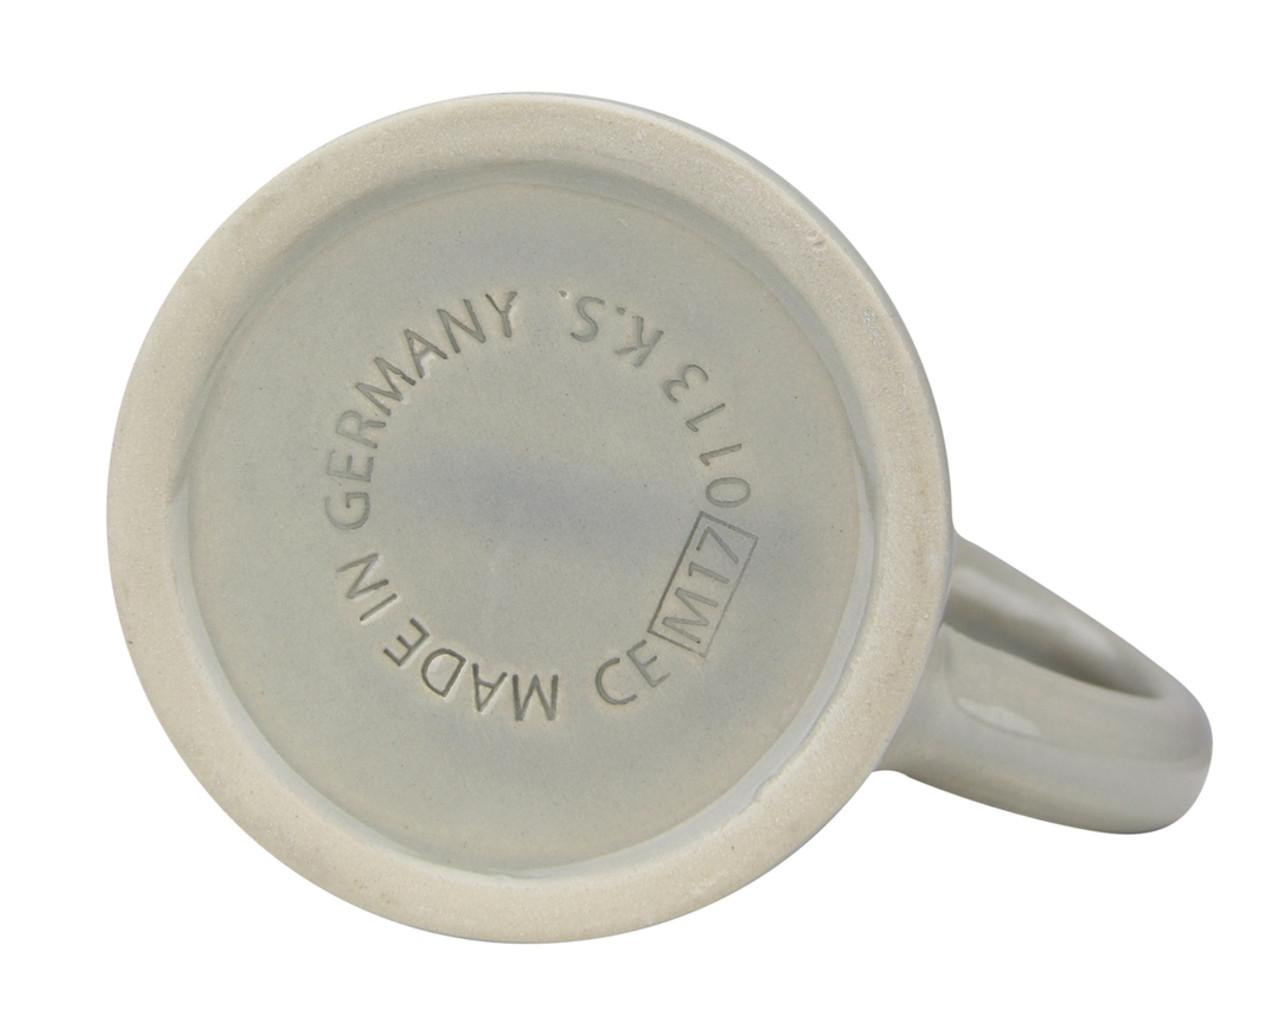 Base of Made in Germany Ceramic Mug